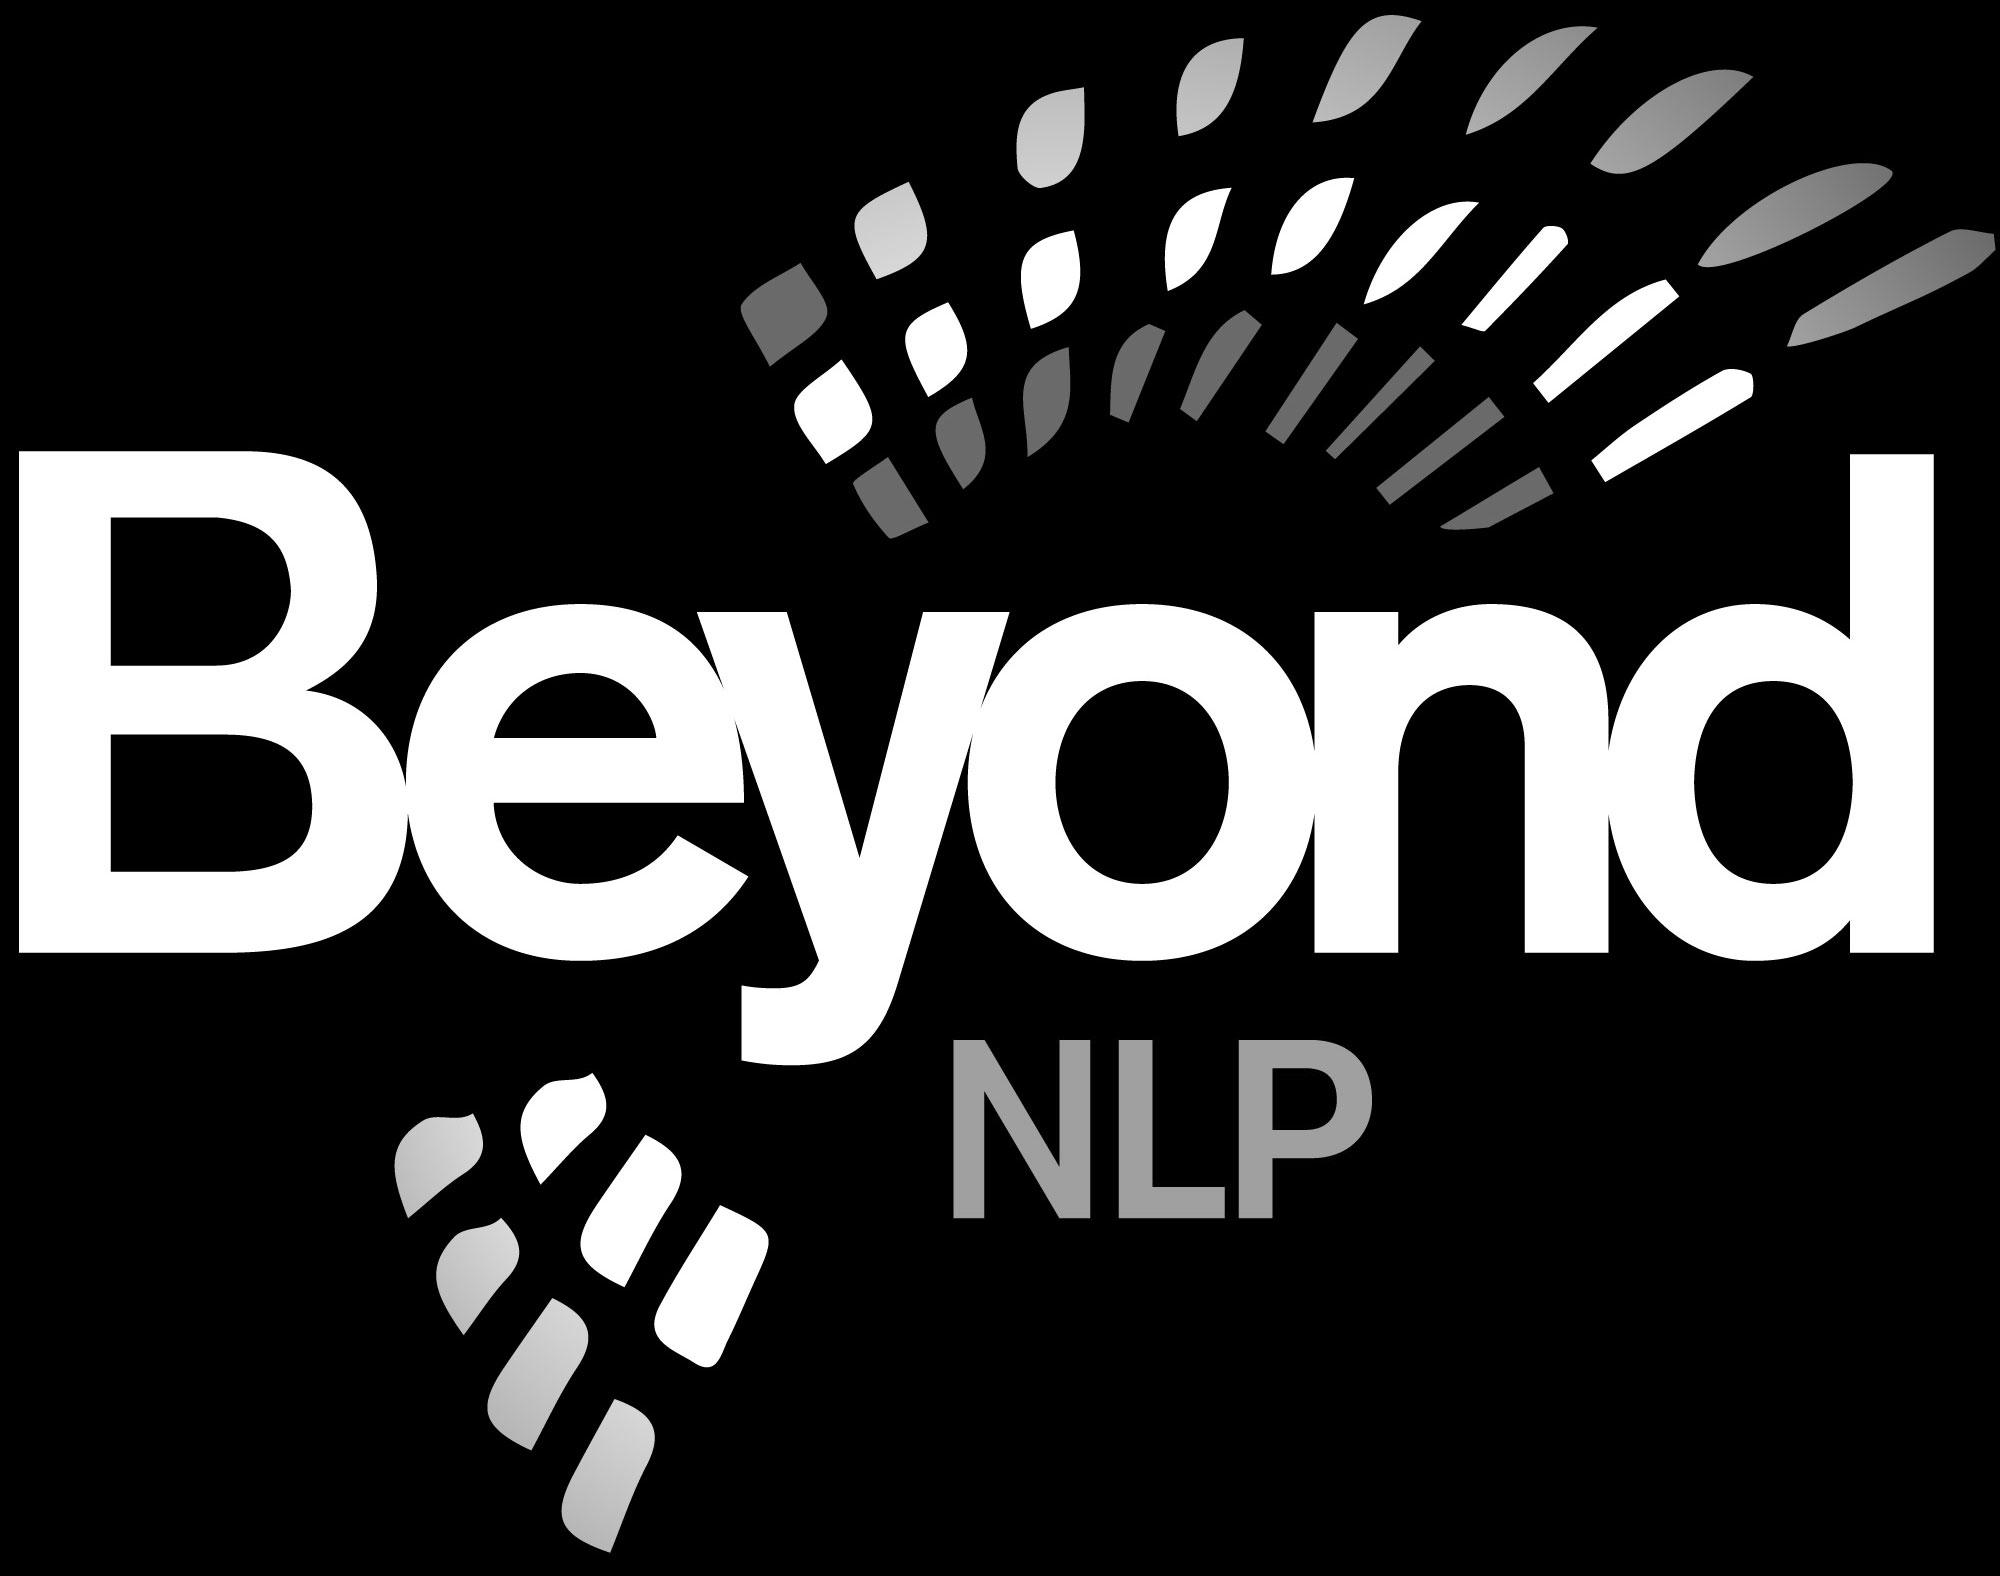 Beyond NLP